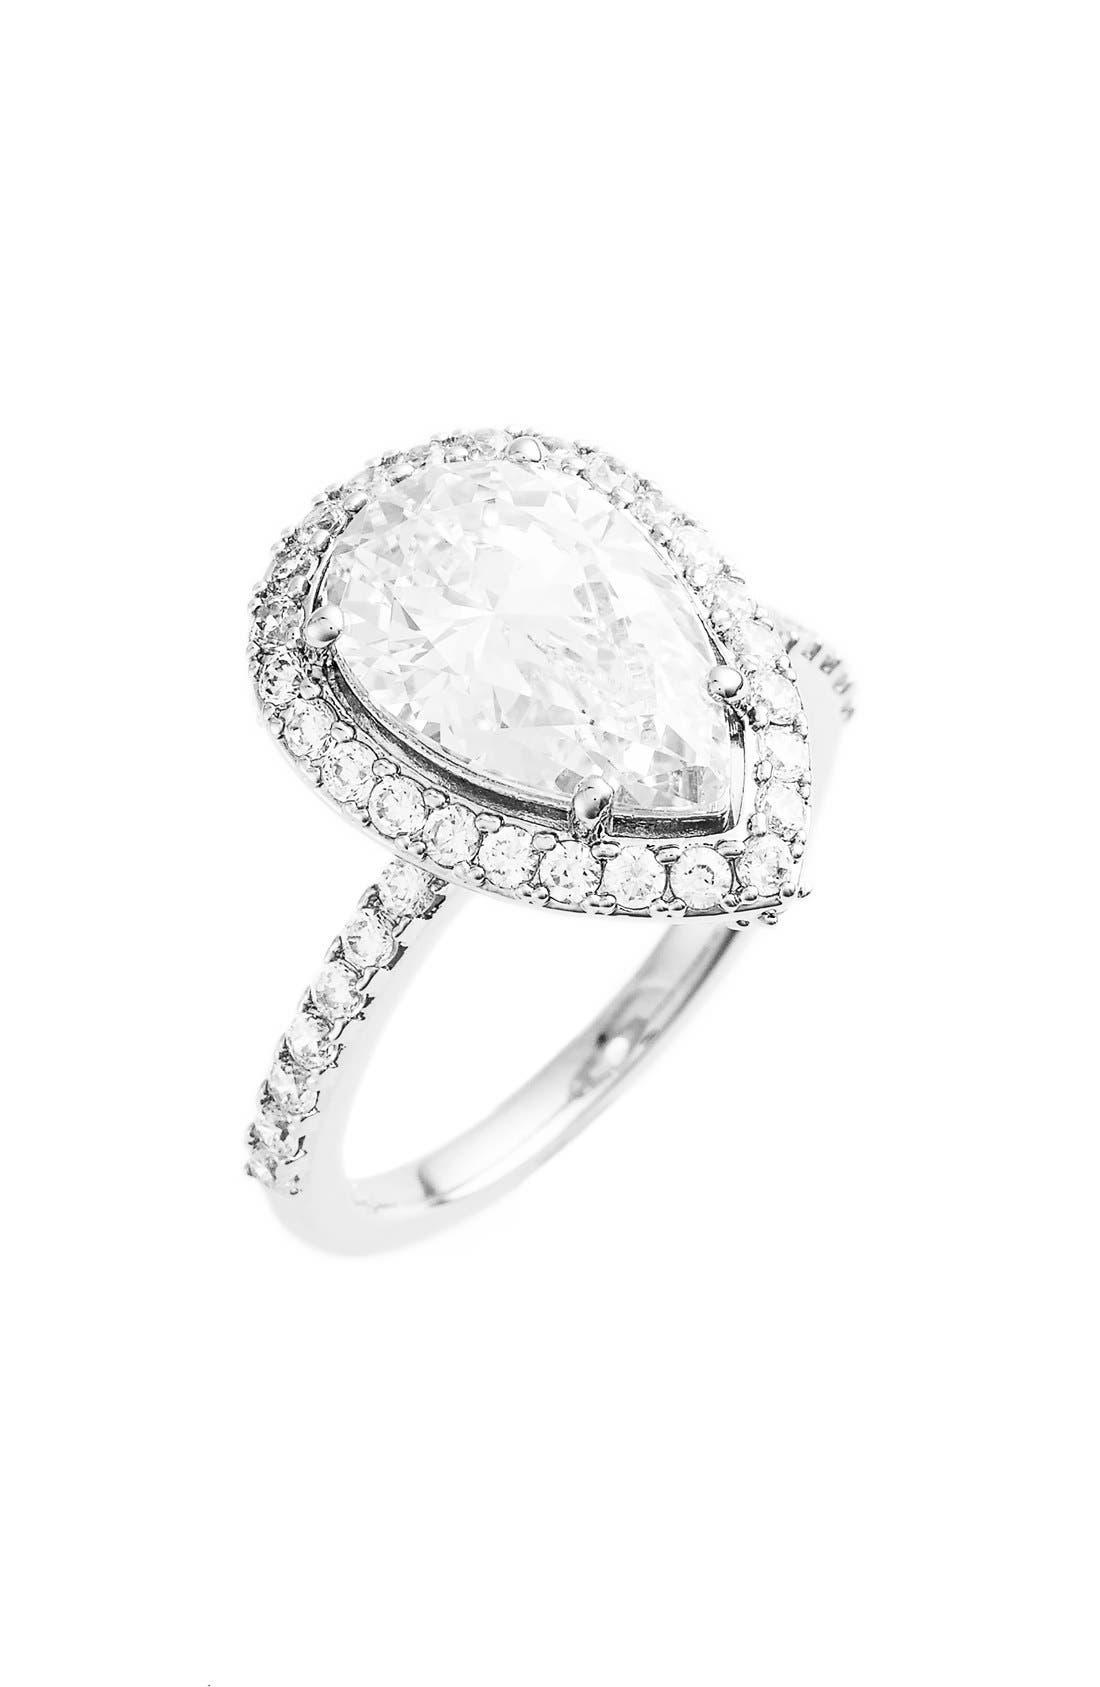 Alternate Image 1 Selected - Nadri Pear Cut Cubic Zirconia Ring